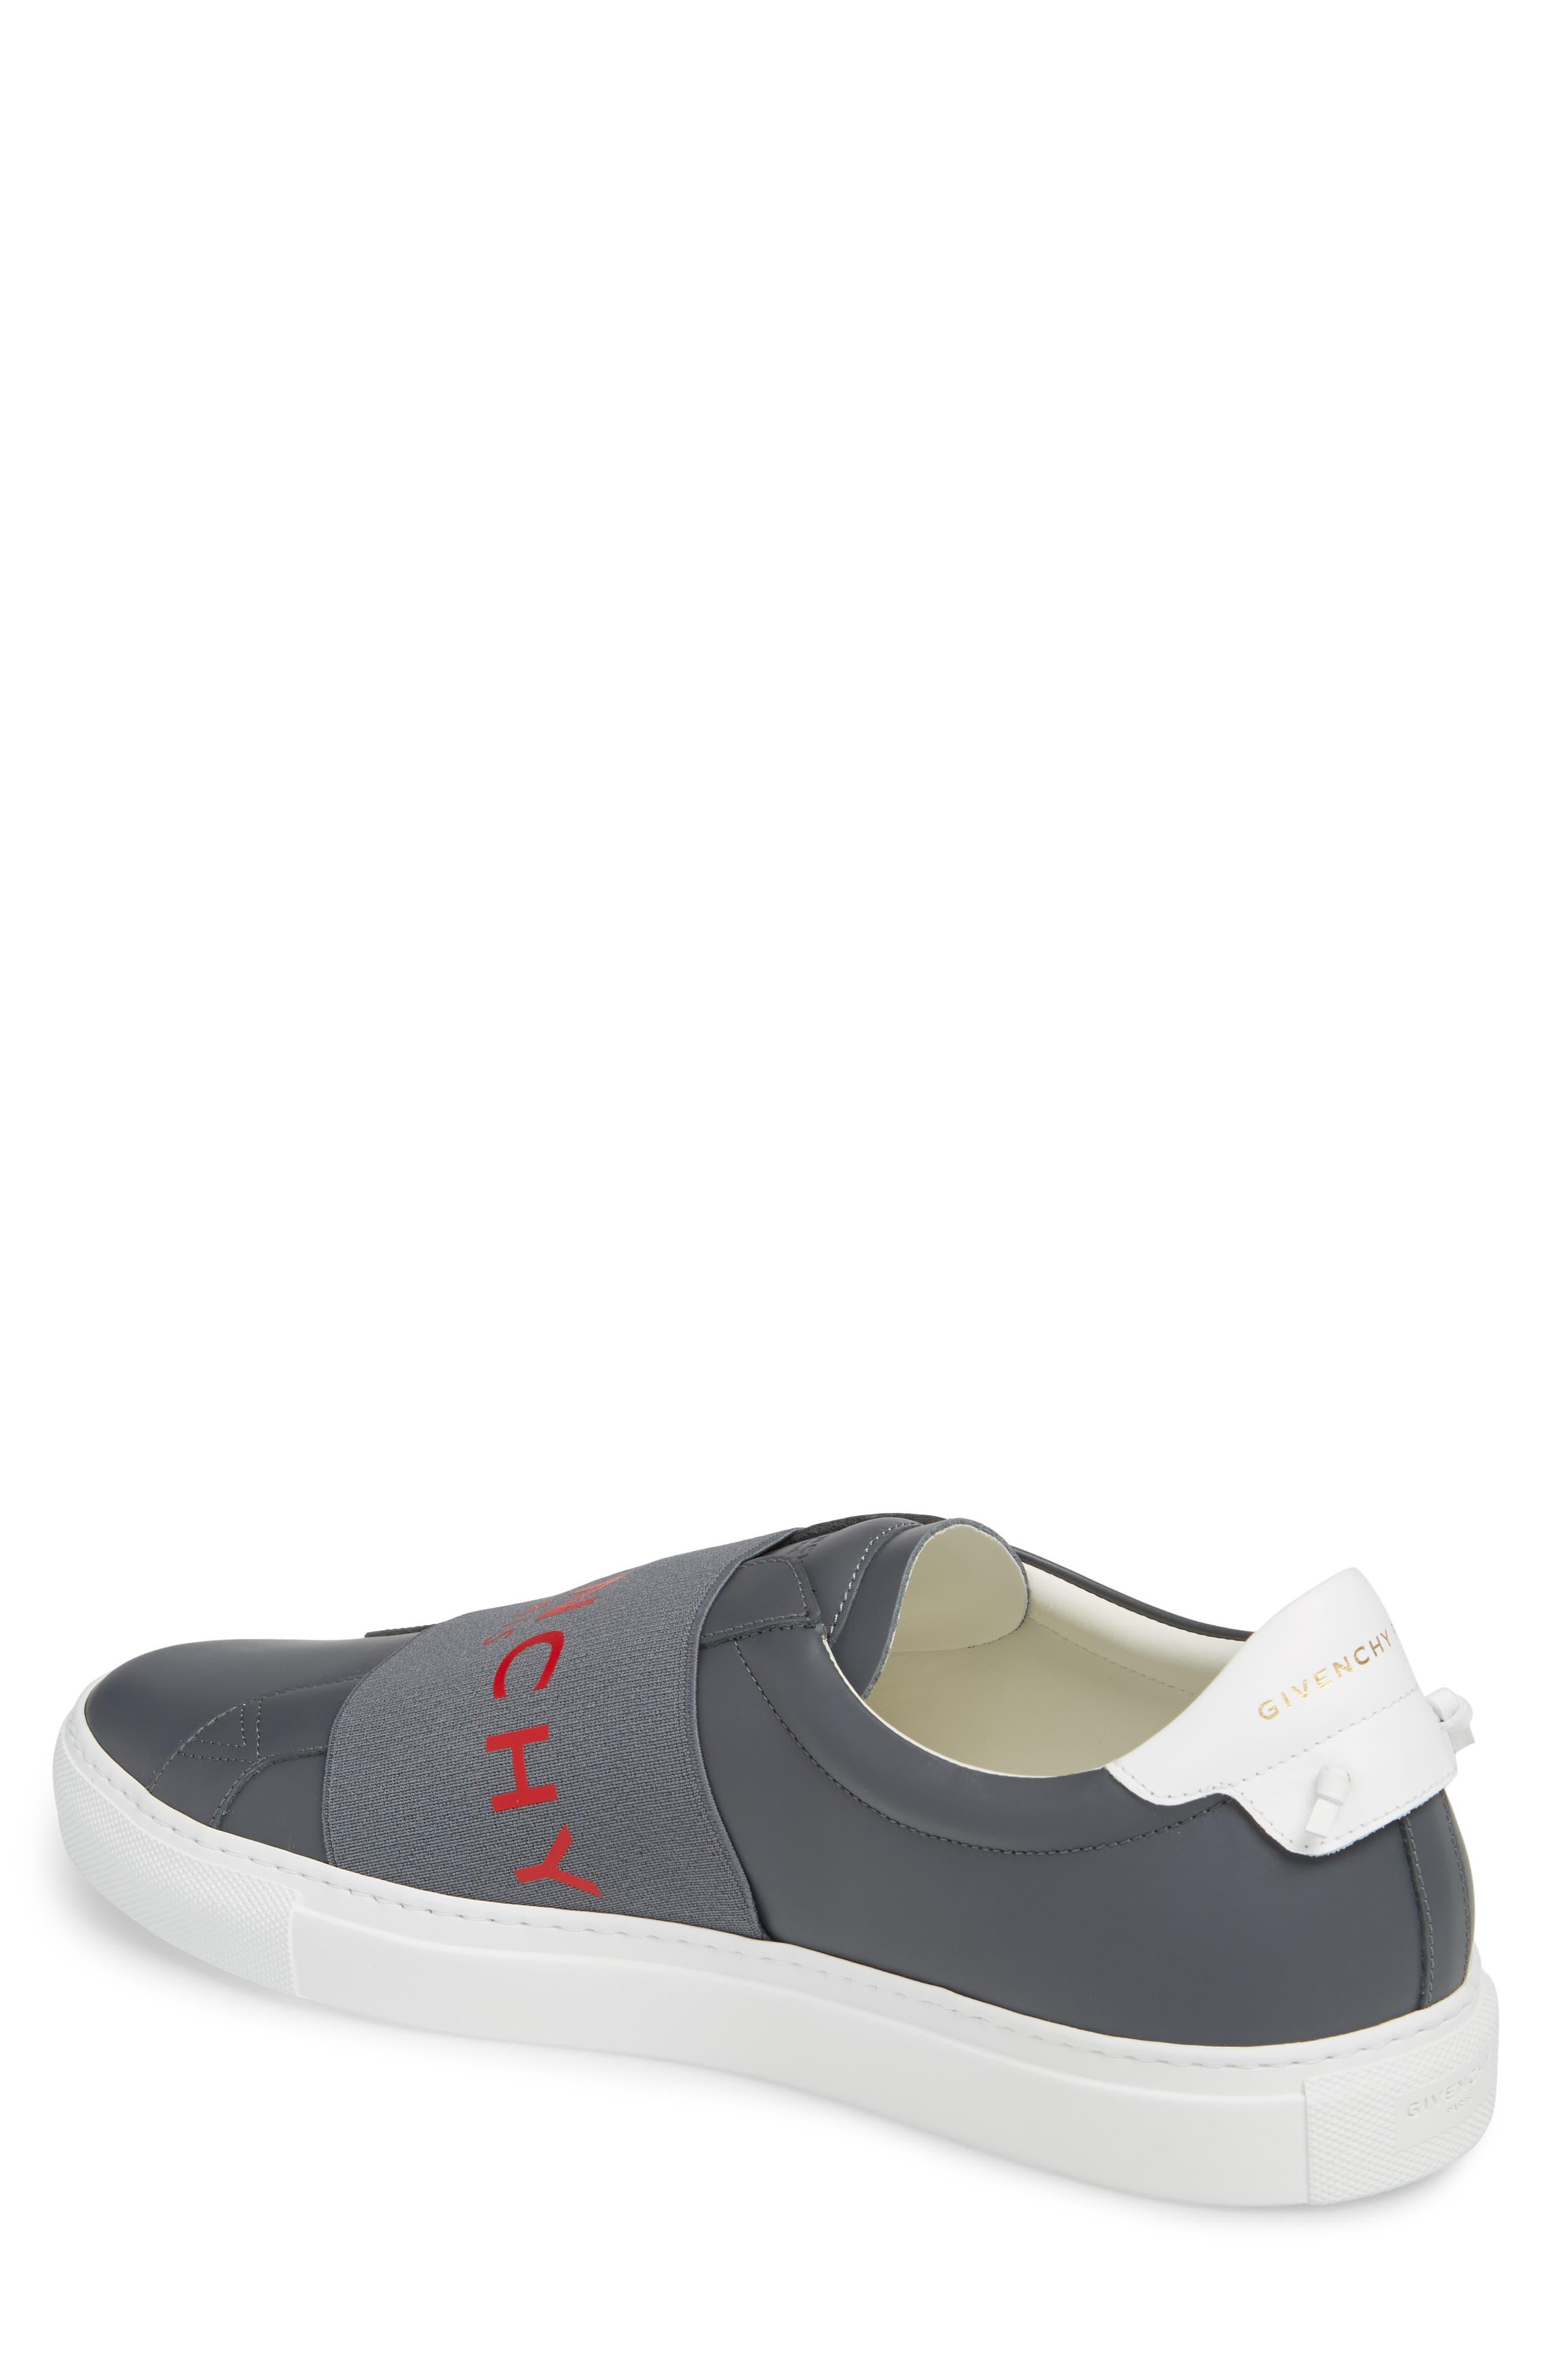 Urban Knots Sneaker,                             Alternate thumbnail 2, color,                             GREY